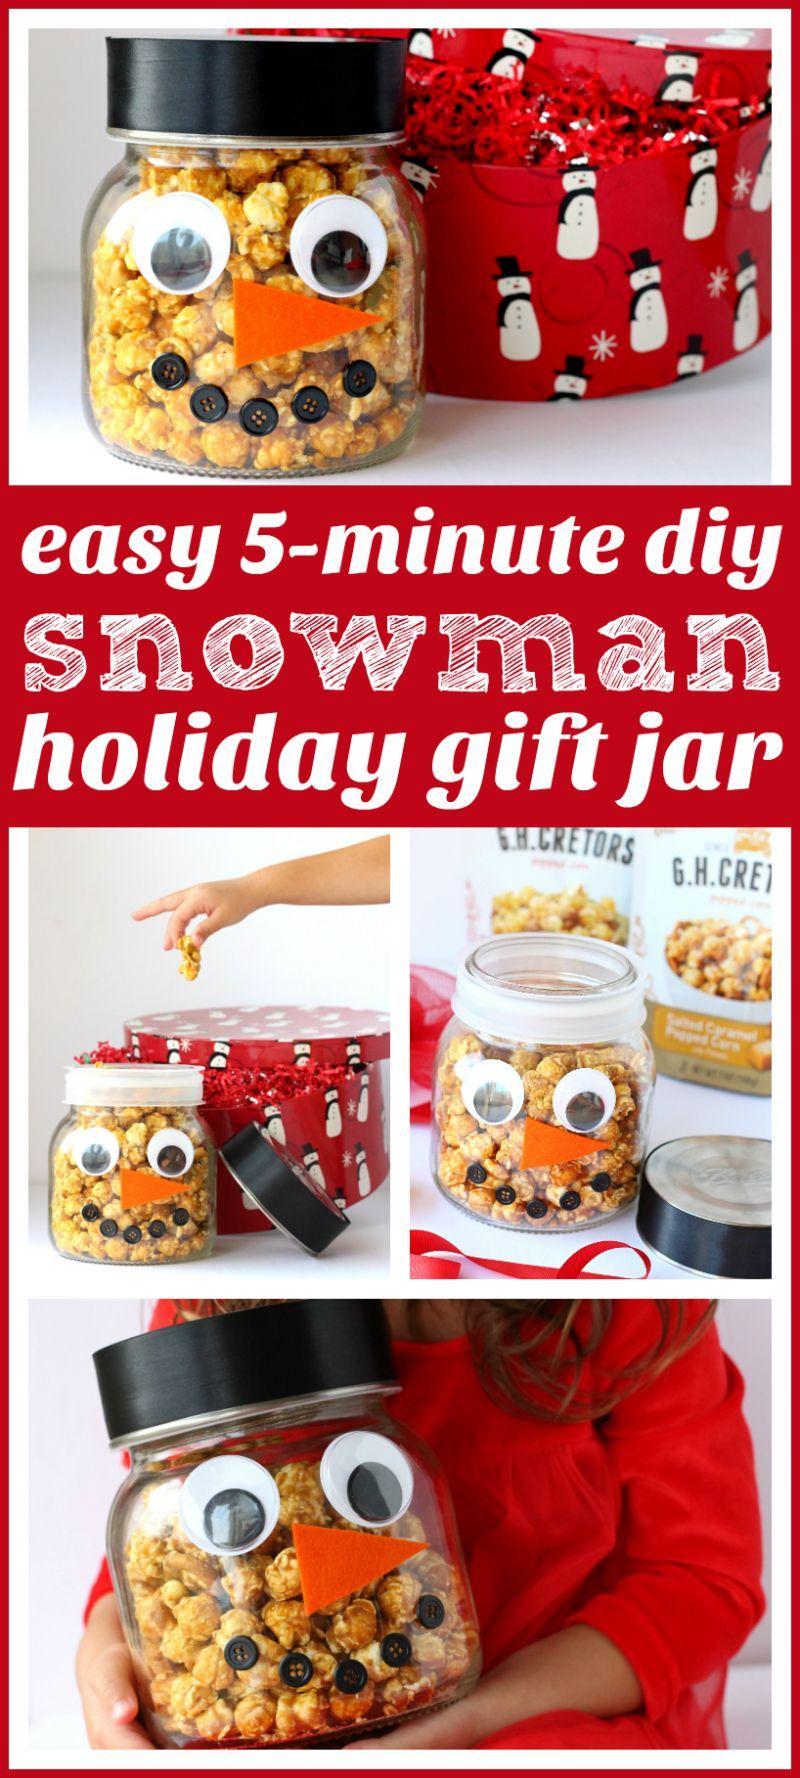 DIY Popcorn Snowman Jar | Easy Holiday Gift Idea   Raising Whasians (AD)